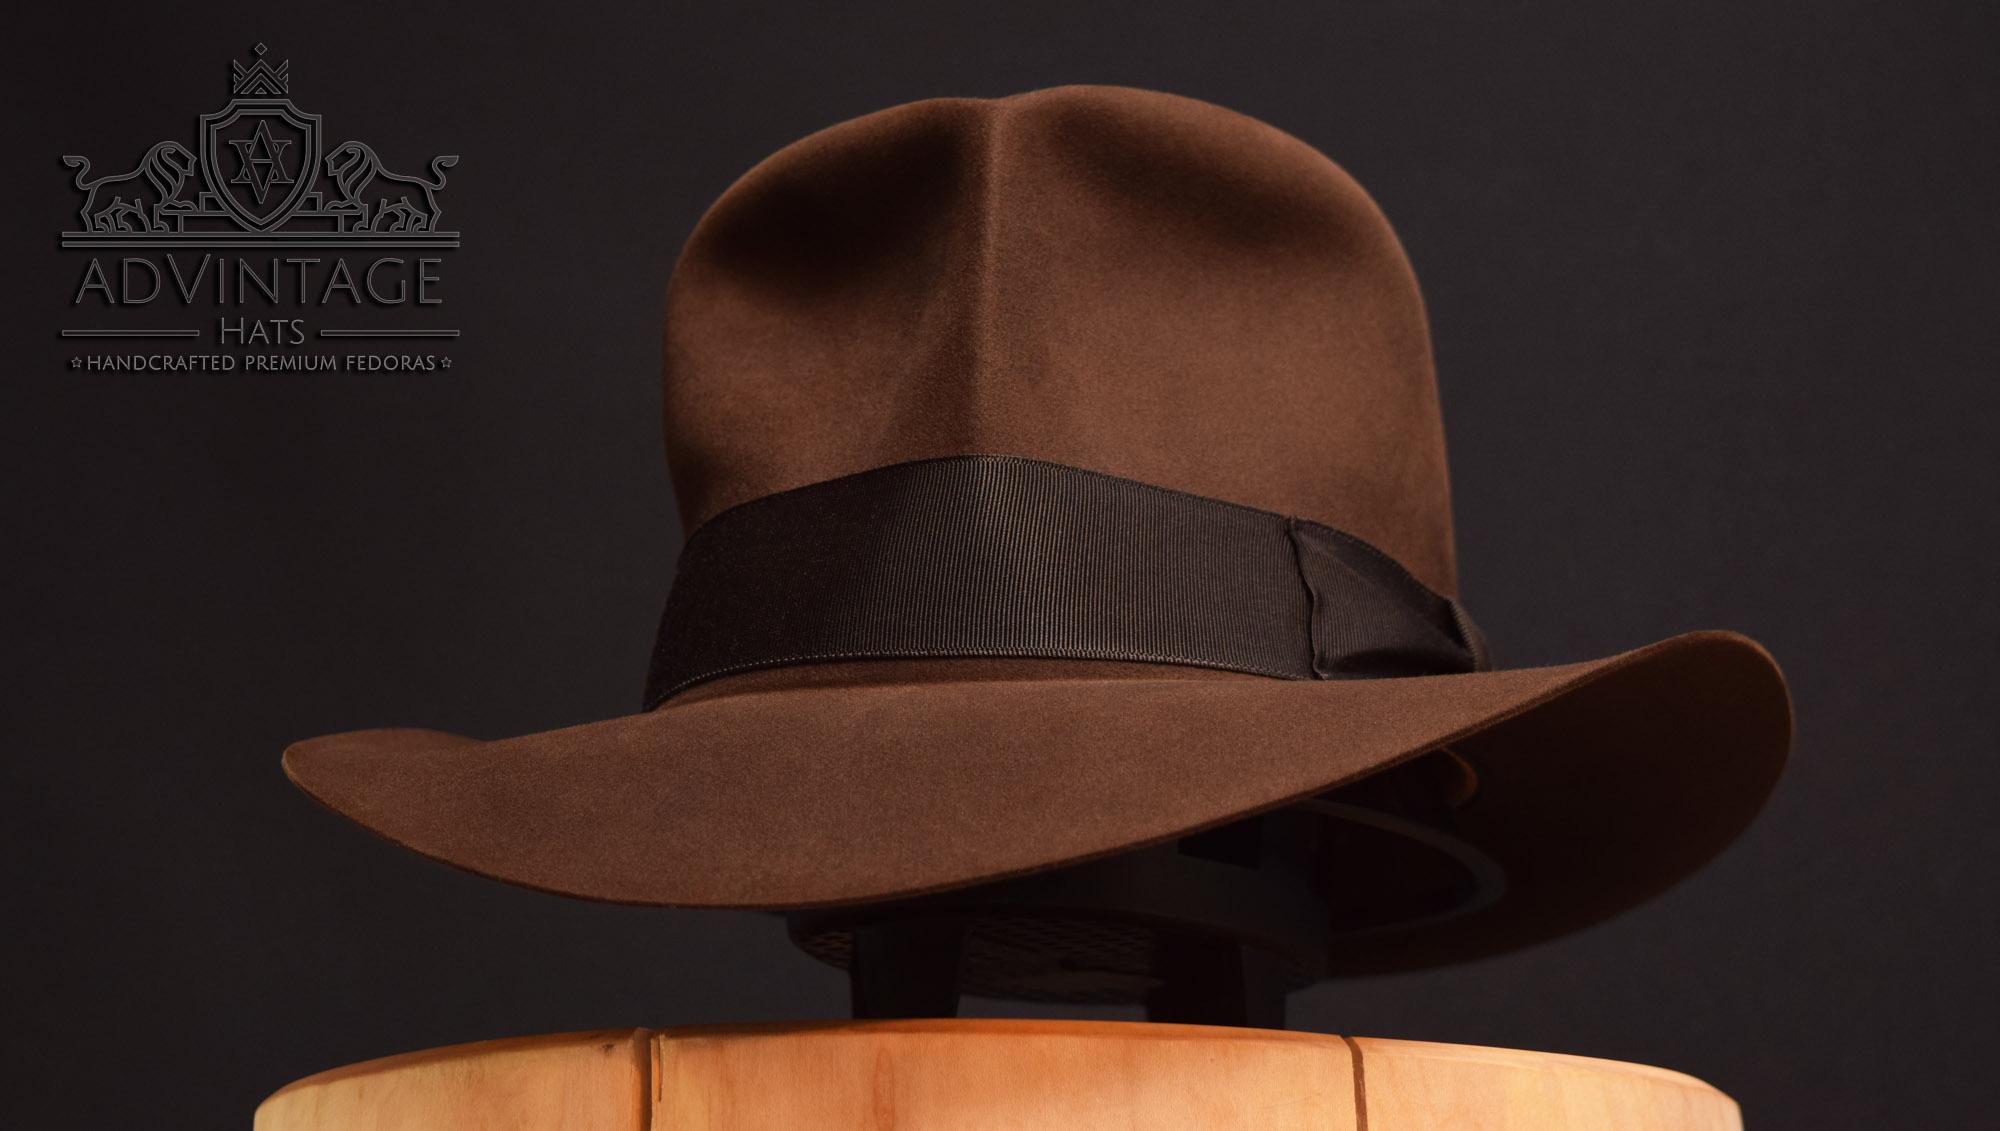 streets of cario soc fedora hut hat indiana jones indy true-sable decent